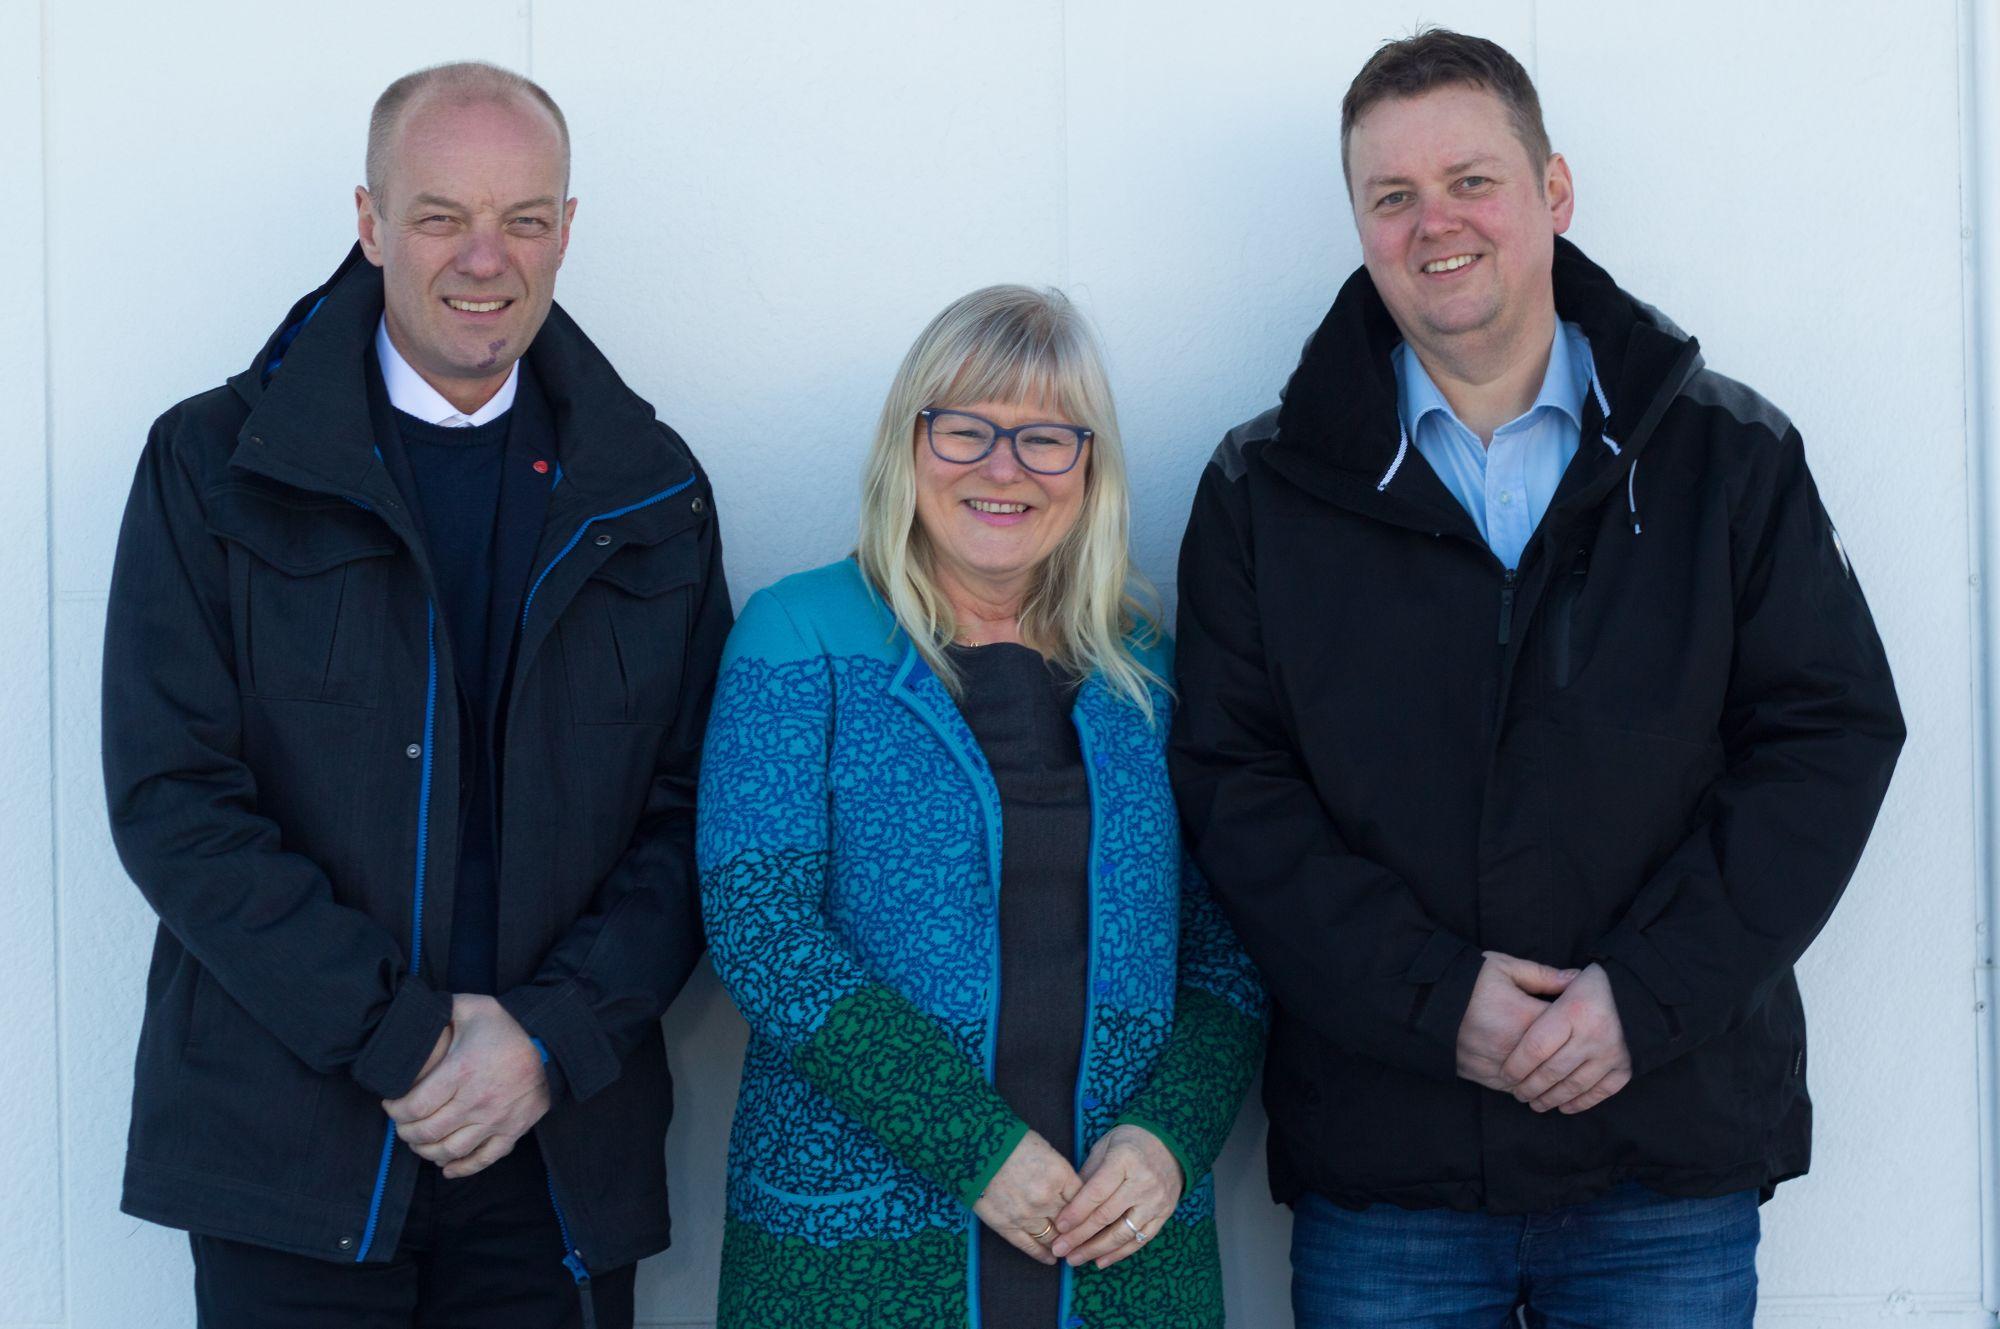 Steinar Karlstrøm, Ingalill Olsen og Runar Sjåstad, stortingskandidater for Finnamrk Arbeiderparti.